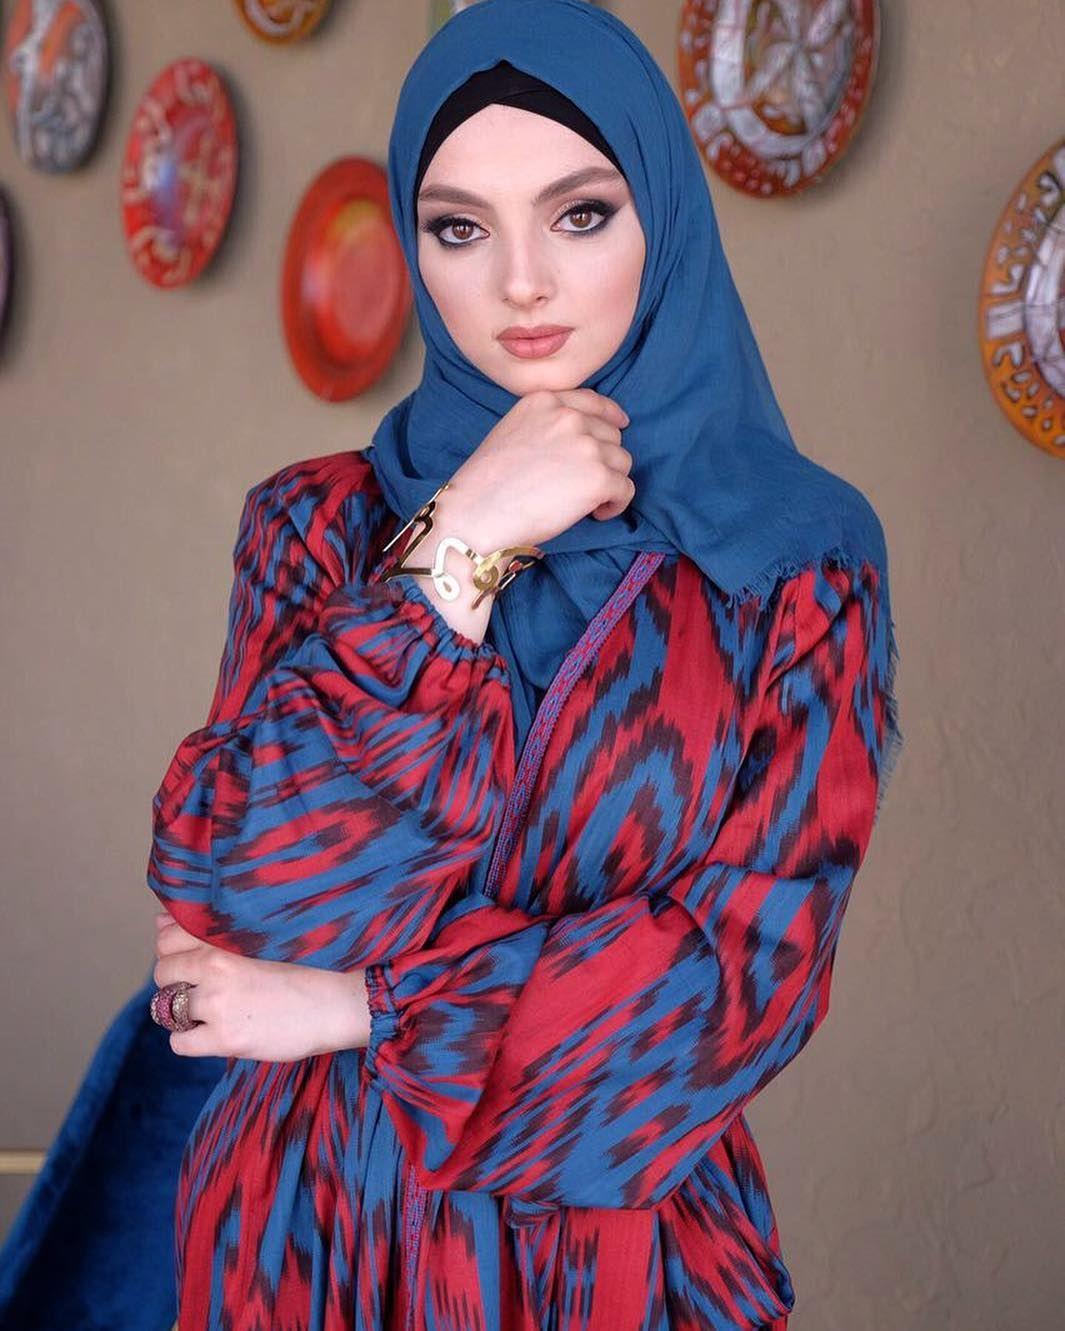 Pin By Asiah On Muslimah Fashion Hijab Styleniqab In 2018 Busana Muslim Abaya Layla Phasmina Niqab Outfit Modest Baju Kurung